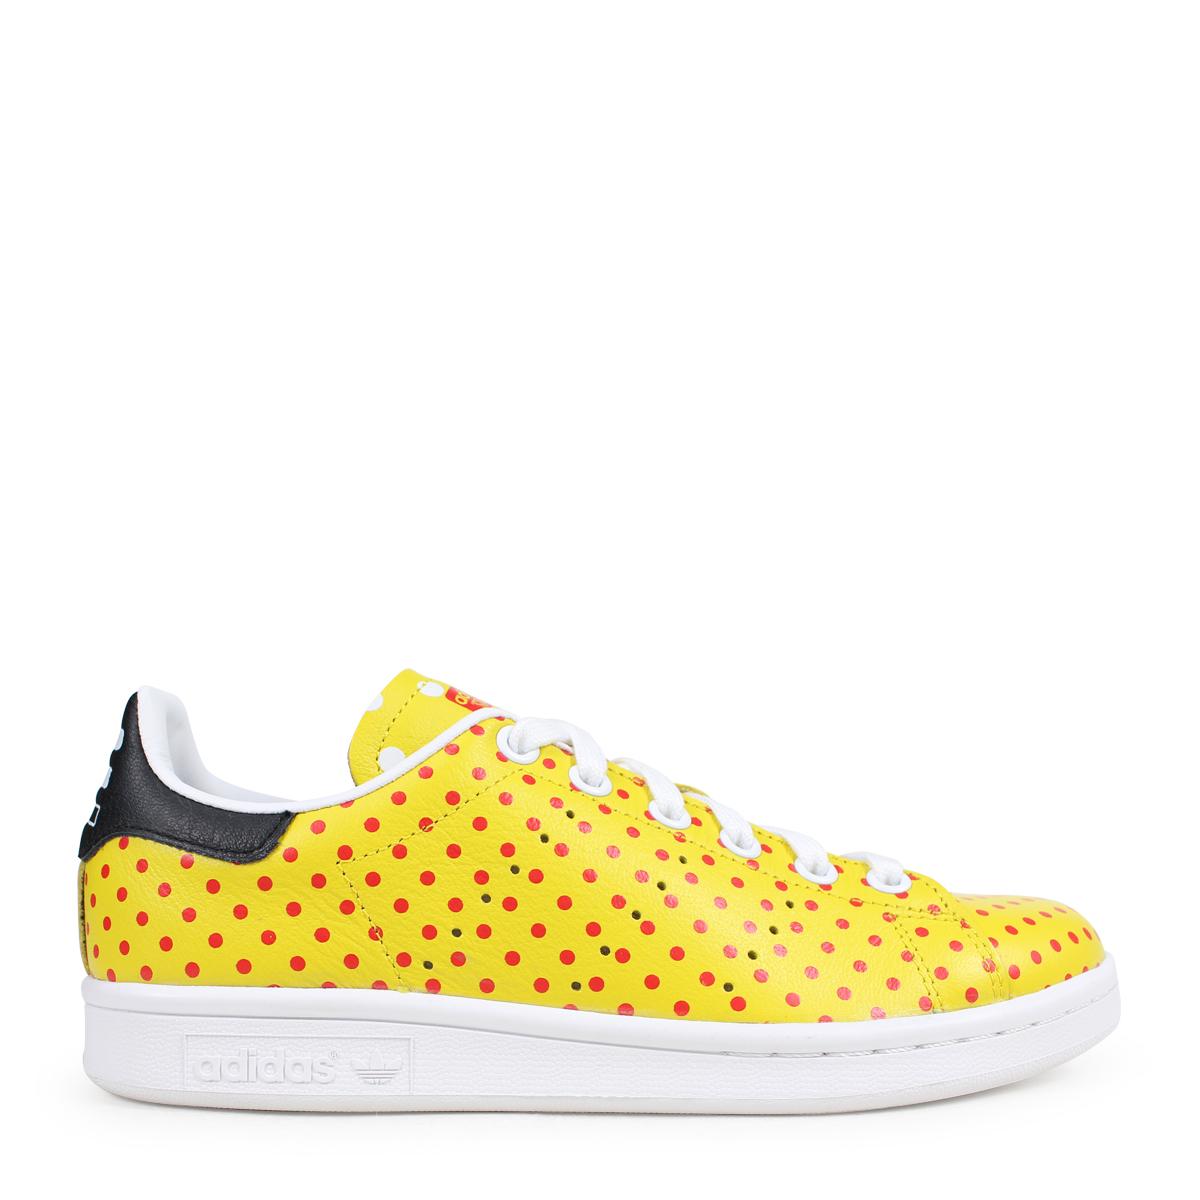 79b9a4f9e294d adidas Originals PW STAN SMITH SPD Adidas Stan Smith sneakers Farrell  Williams Lady s collaboration B25402 yellow originals  3 15 Shinnyu load    183